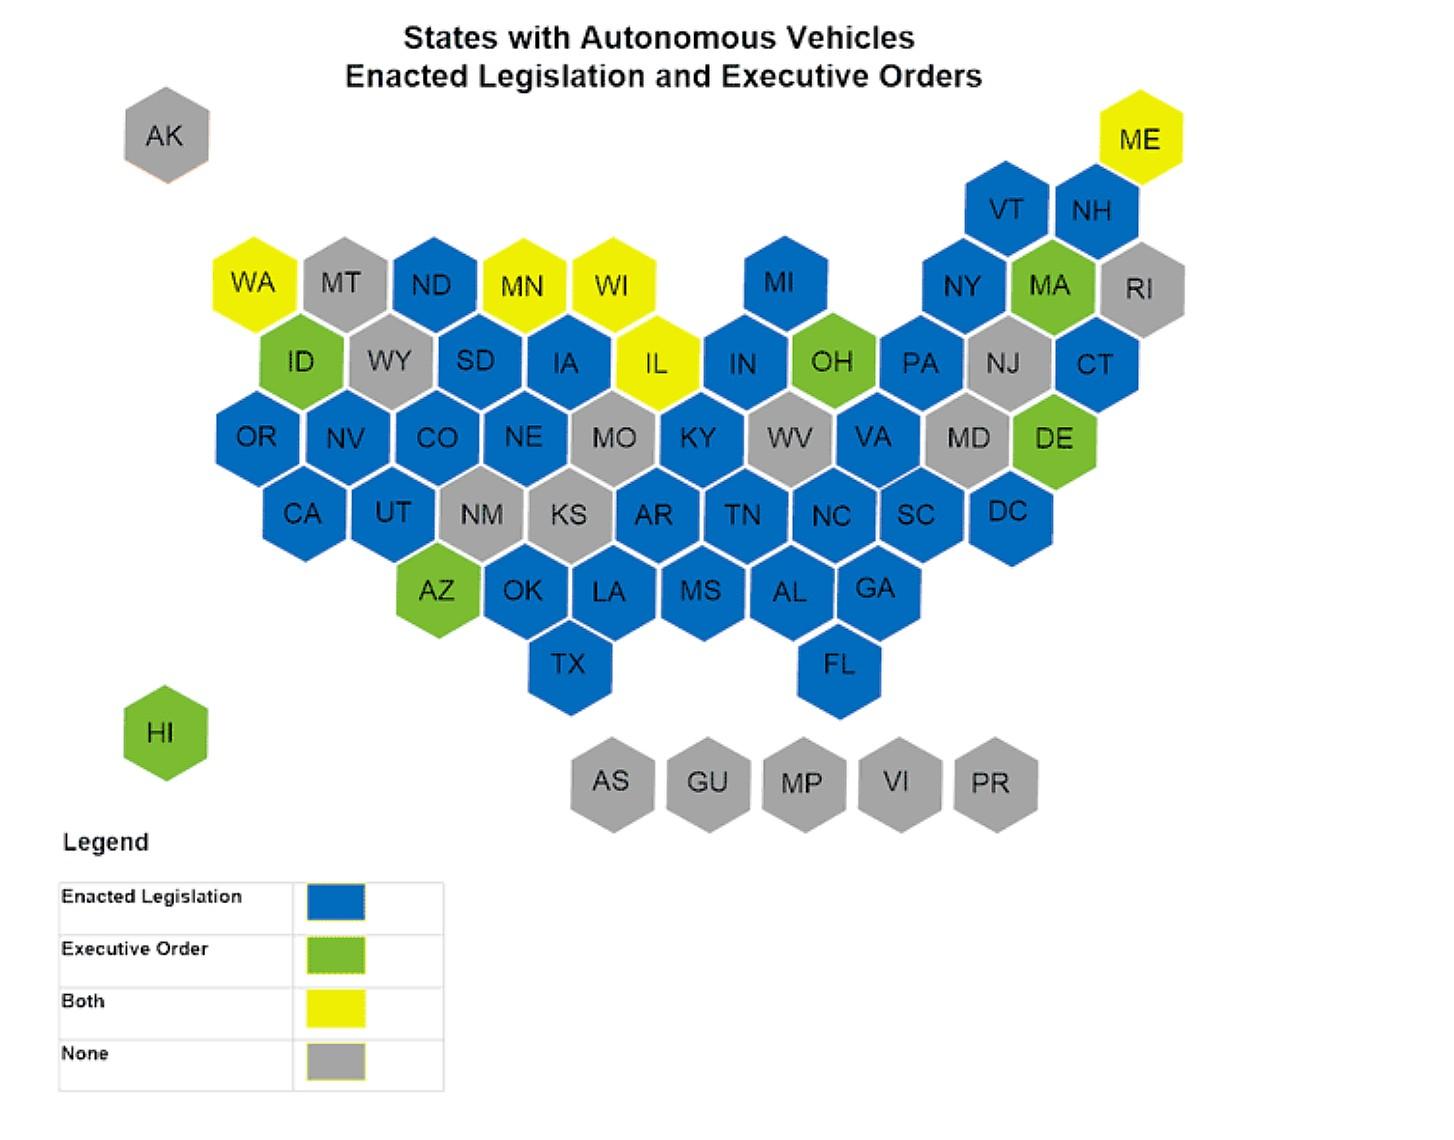 states-with-autonomous-vehicles-enacted-legislation-executive-orders